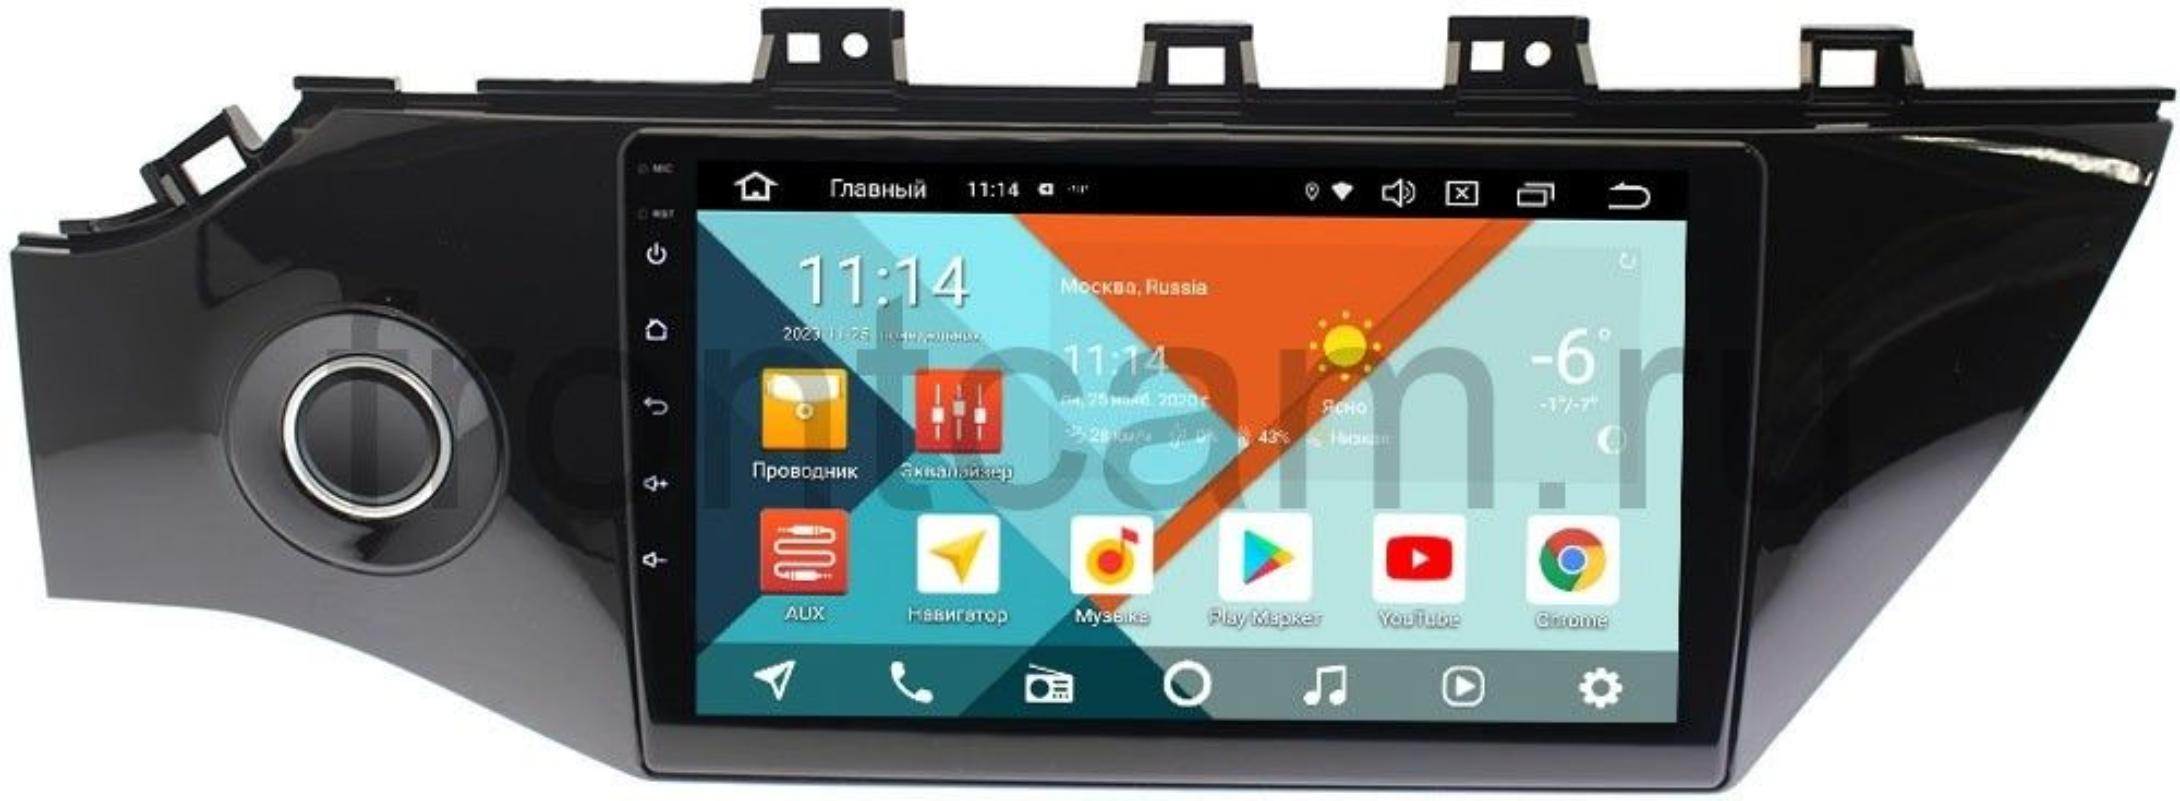 Штатная магнитола Kia Rio IV, Rio IV X-Line Wide Media KS9012QR-3/32 DSP CarPlay 4G-SIM на Android 10(с кнопкой) (+ Камера заднего вида в подарок!)